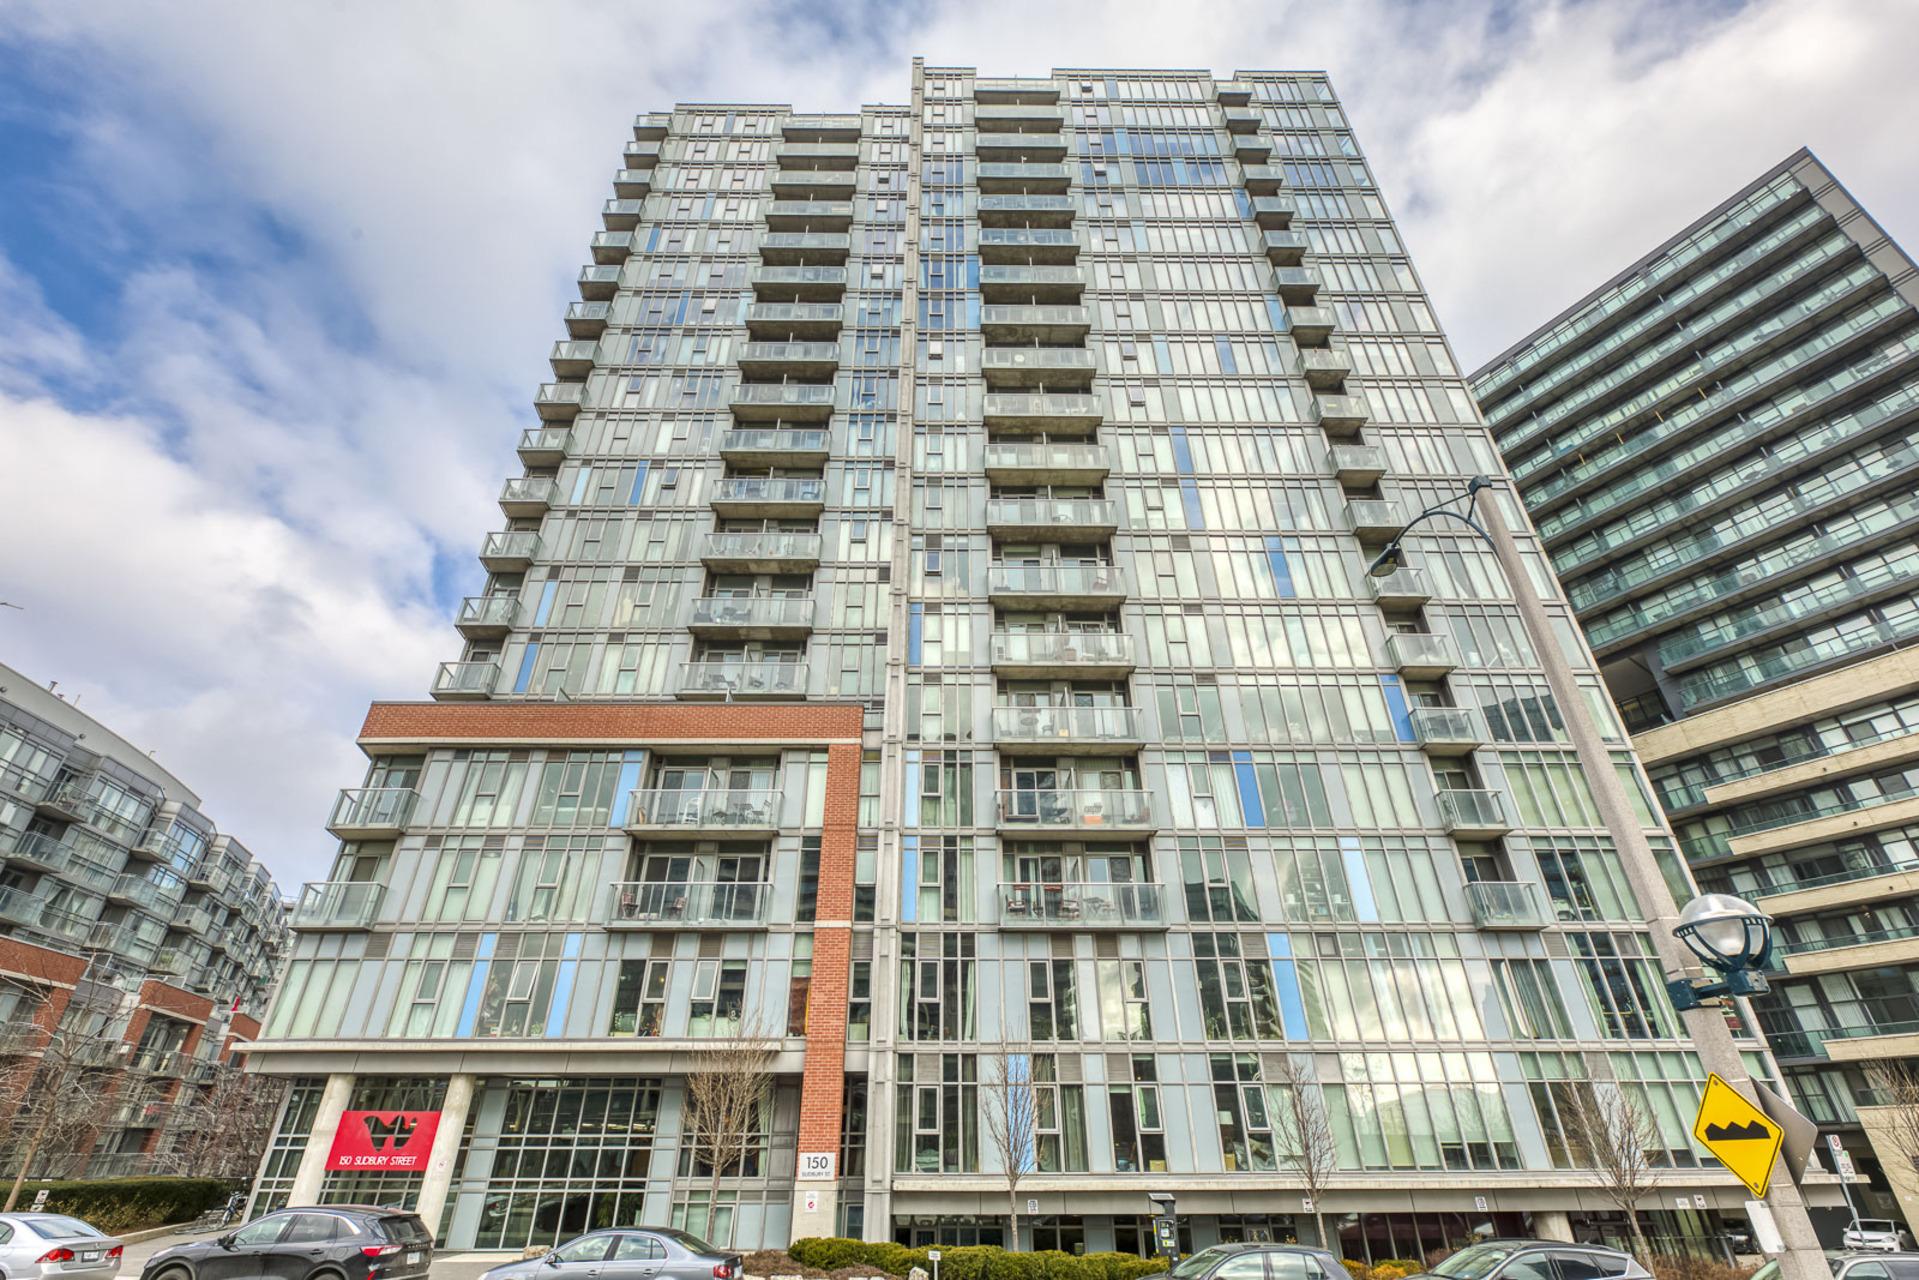 Exterior - 1512-150 Sudbury St, Toronto - Elite3 & Team at 1512 - 150 Sudbury Street, Little Portugal, Toronto